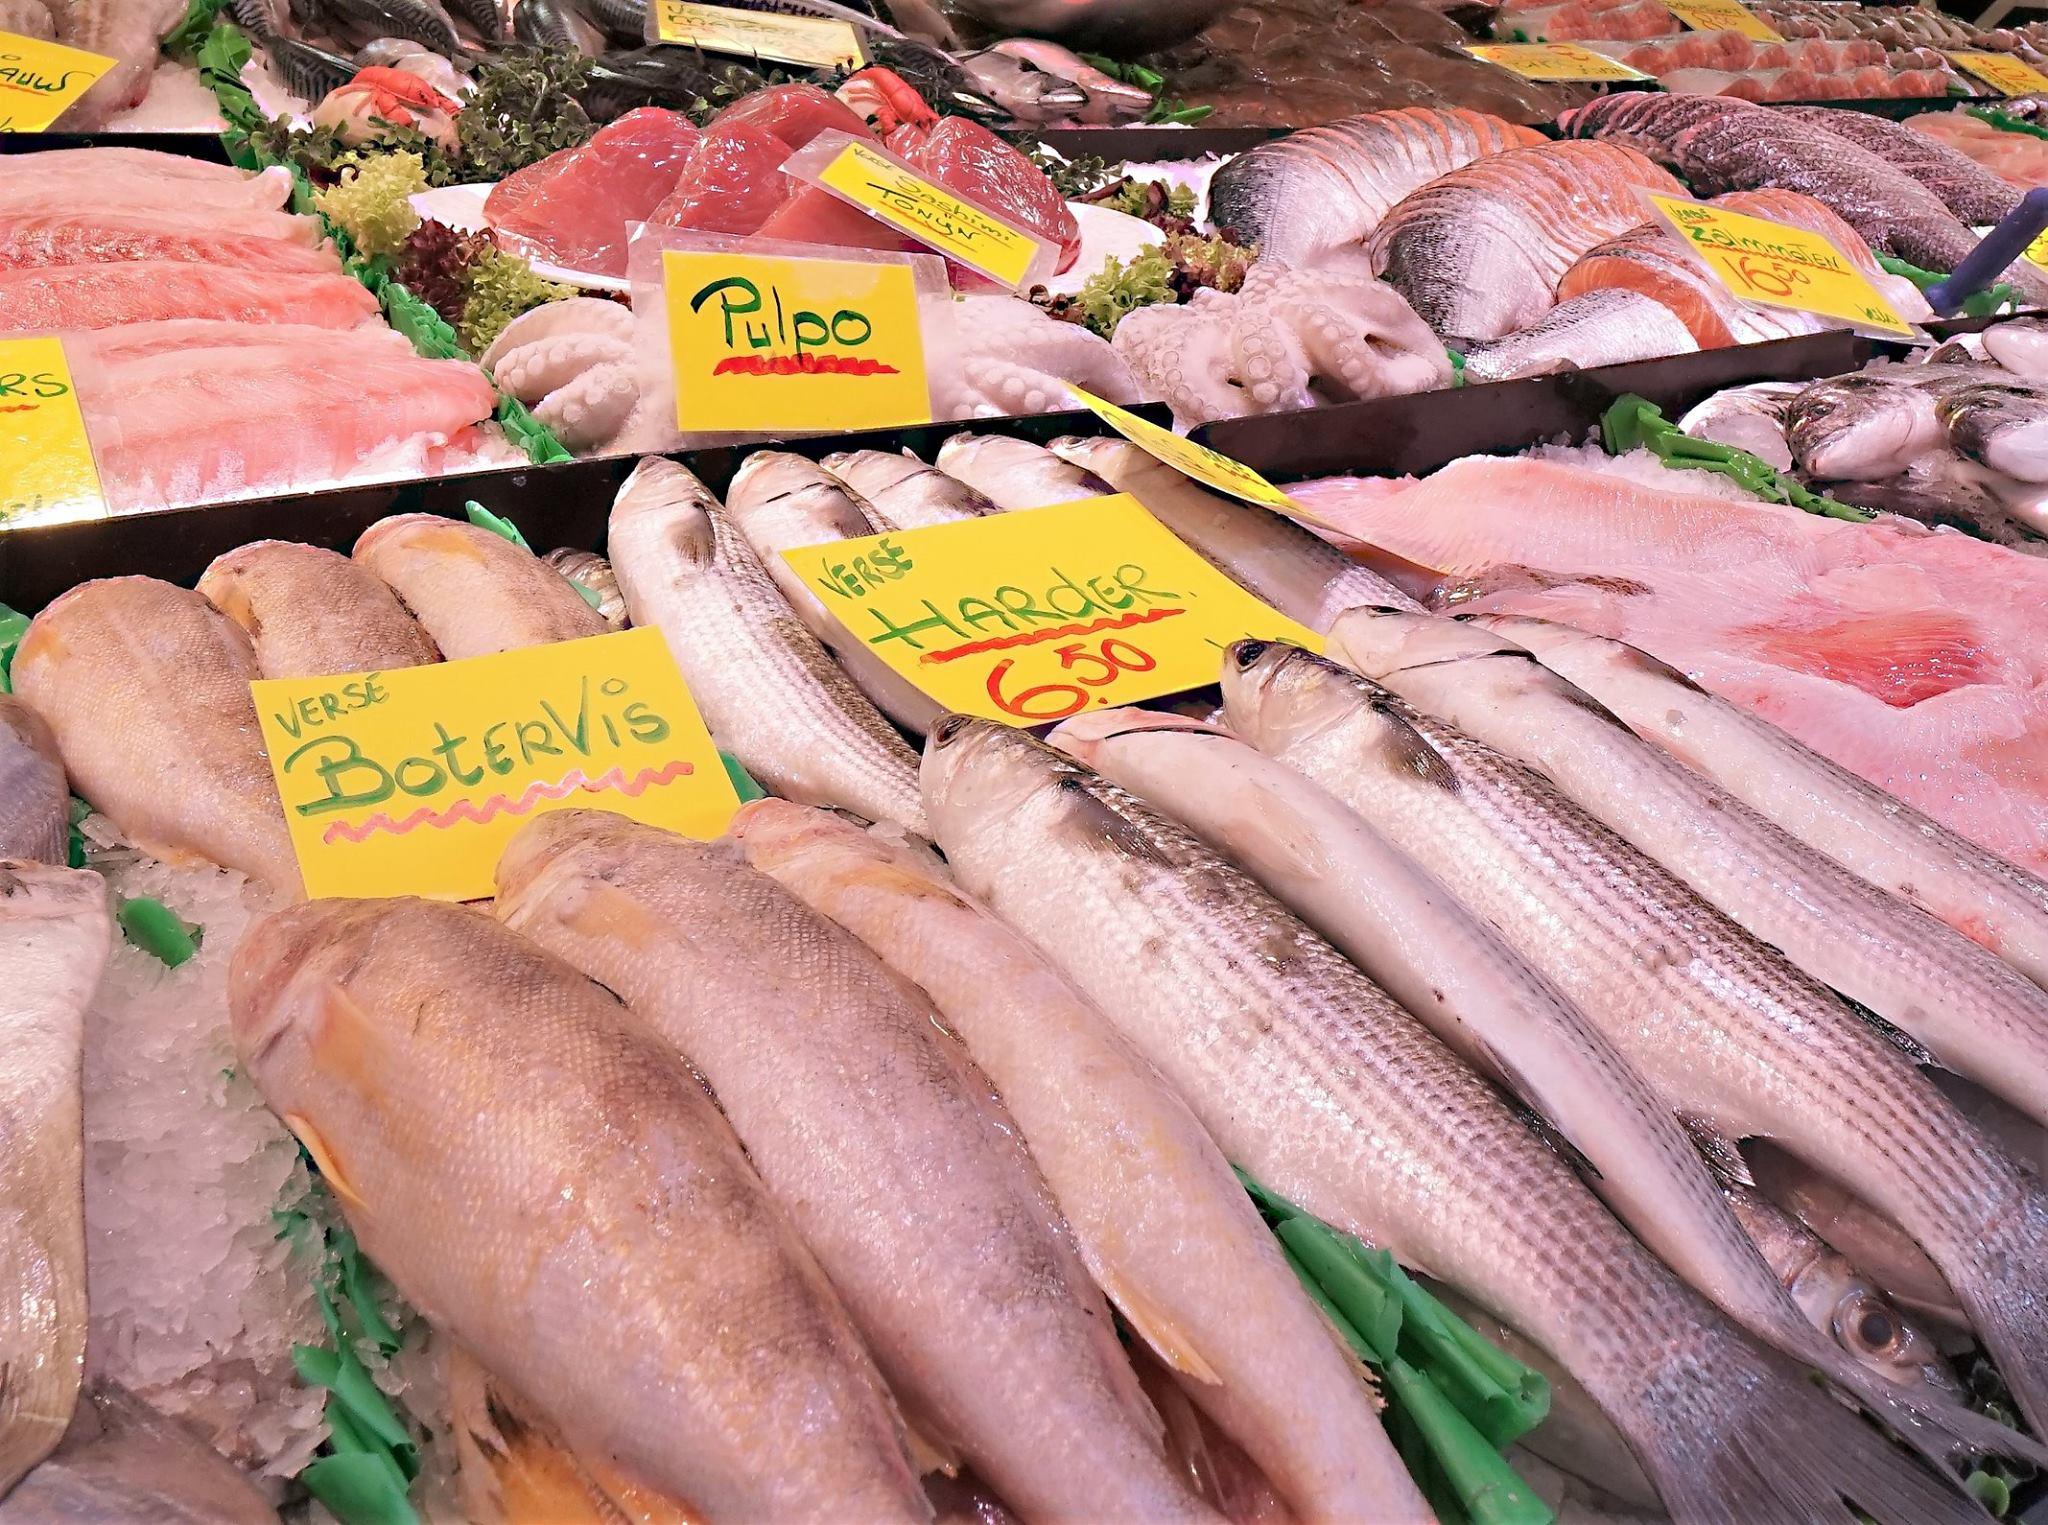 Vishandel Brouwer 8